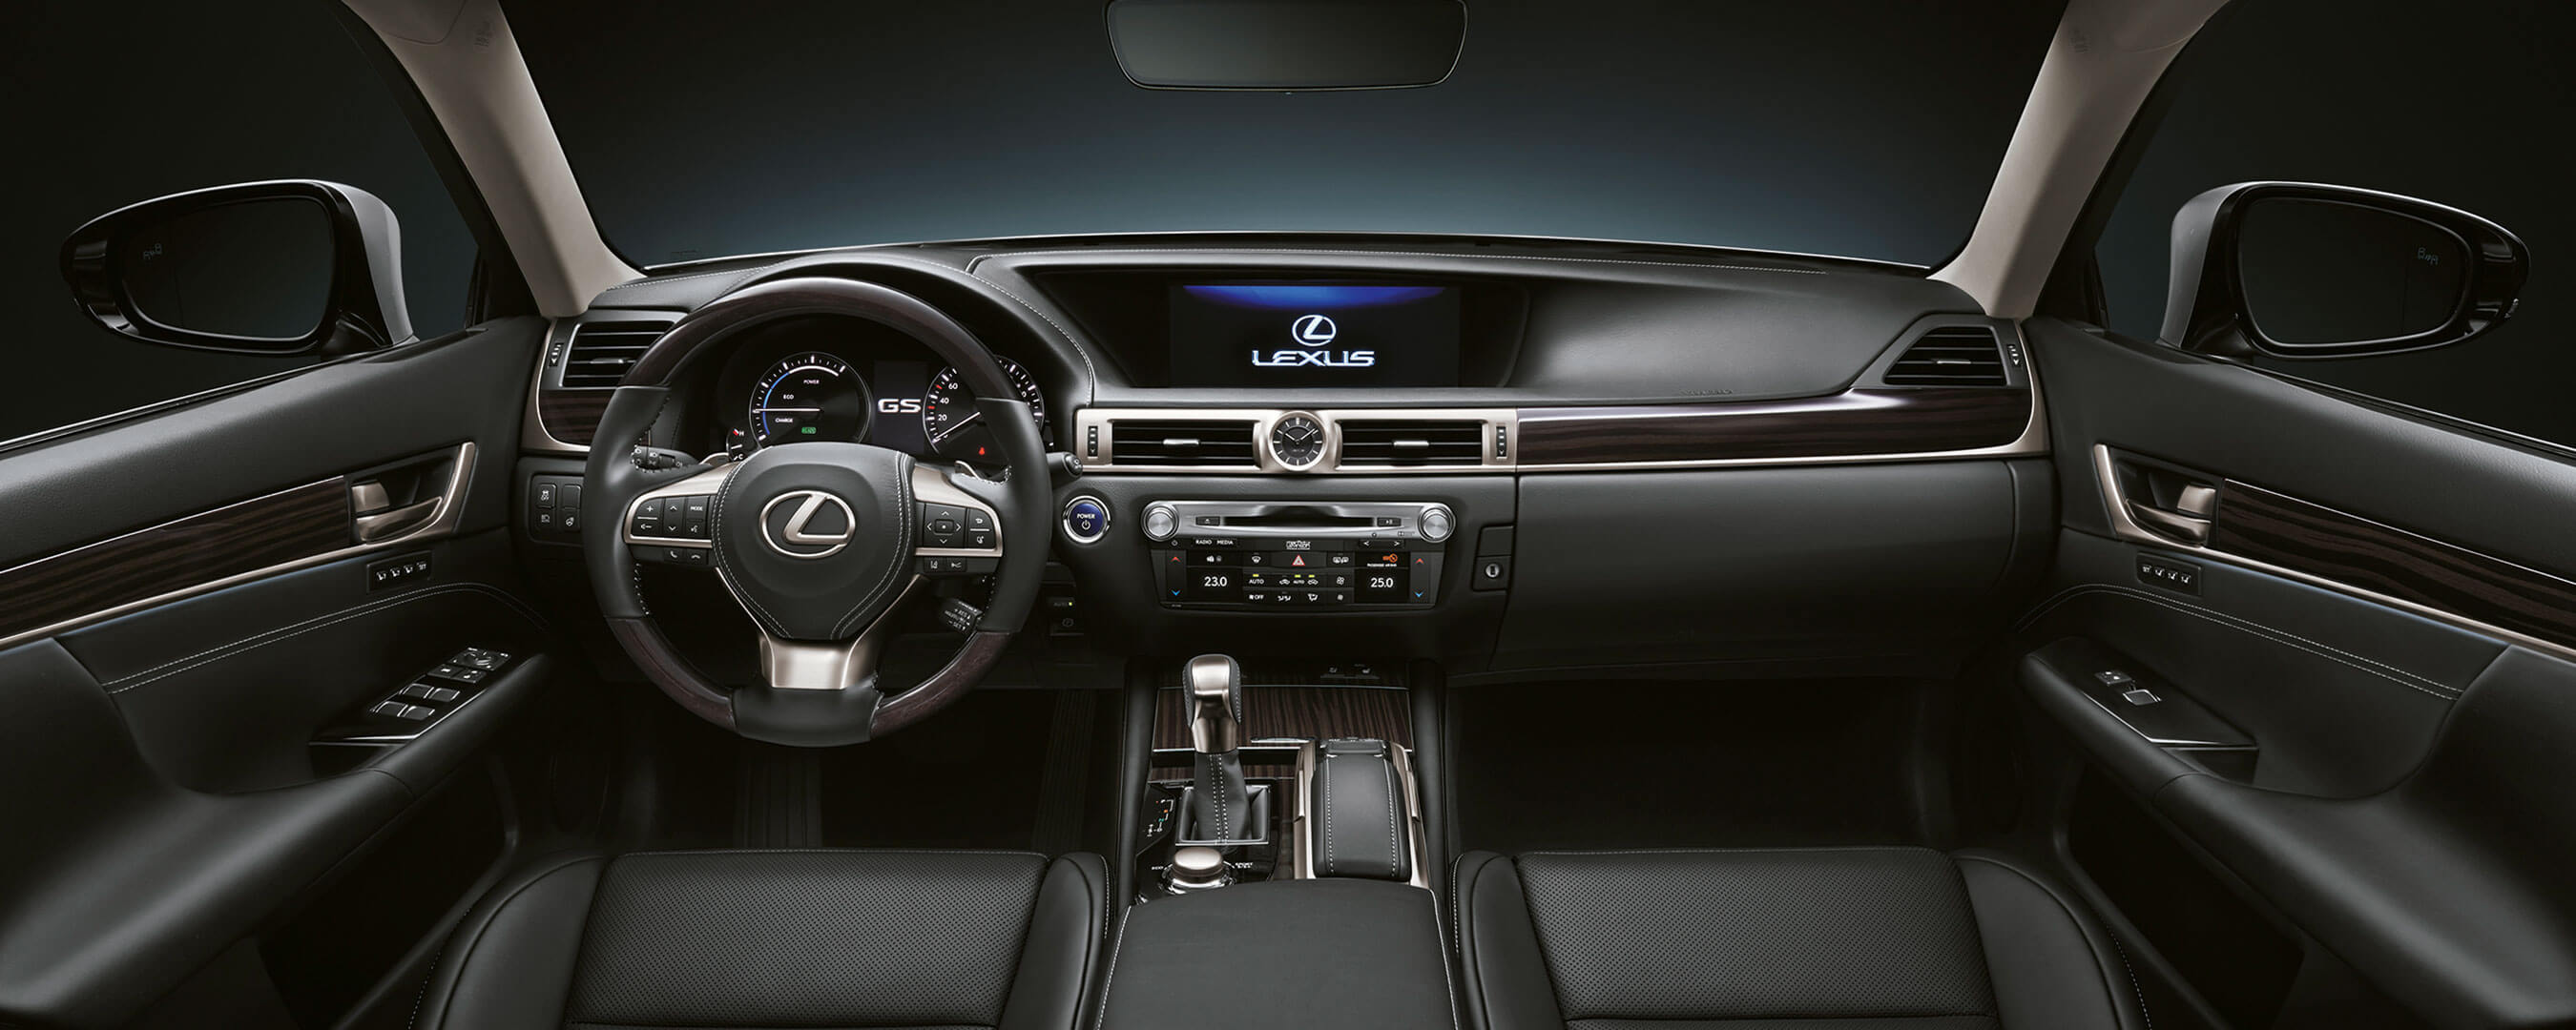 2017 lexus gs 450h experience hero interior front